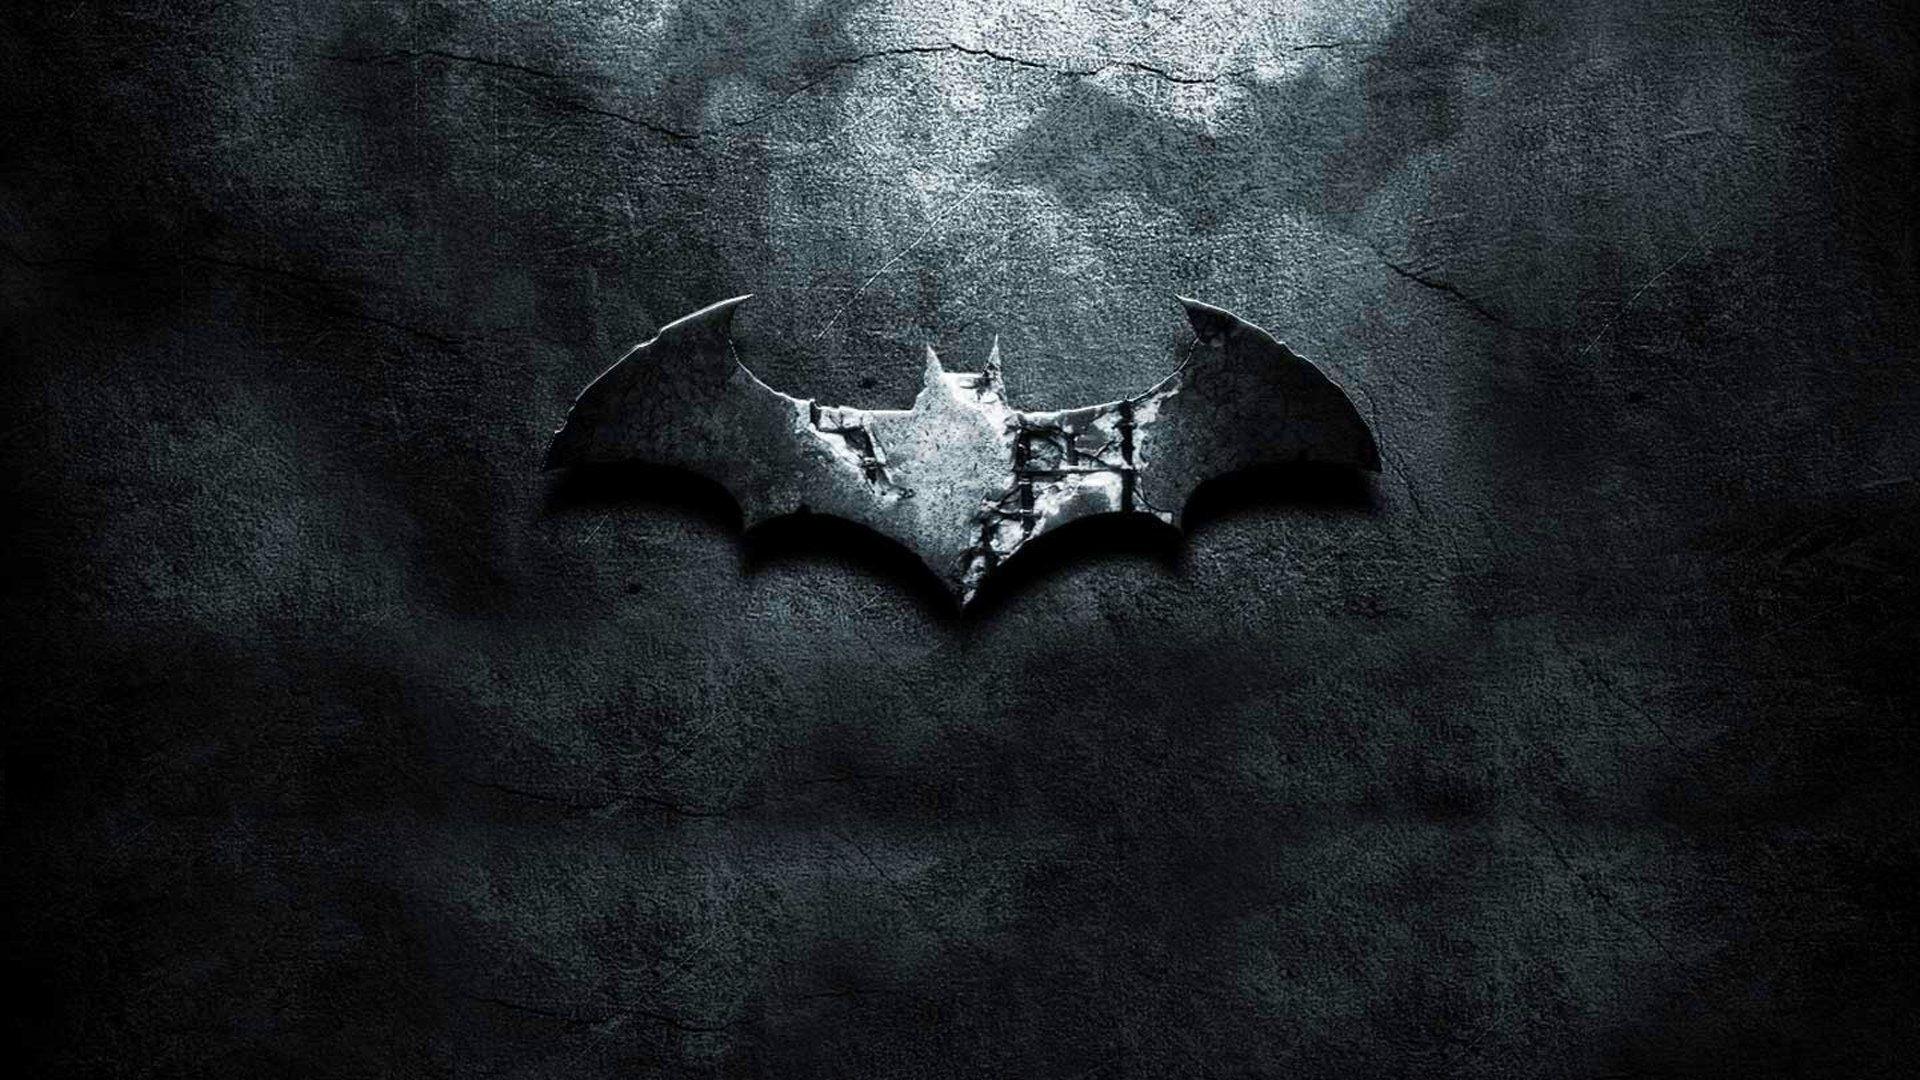 Batman Wallpaper Hd Download Free High Resolution